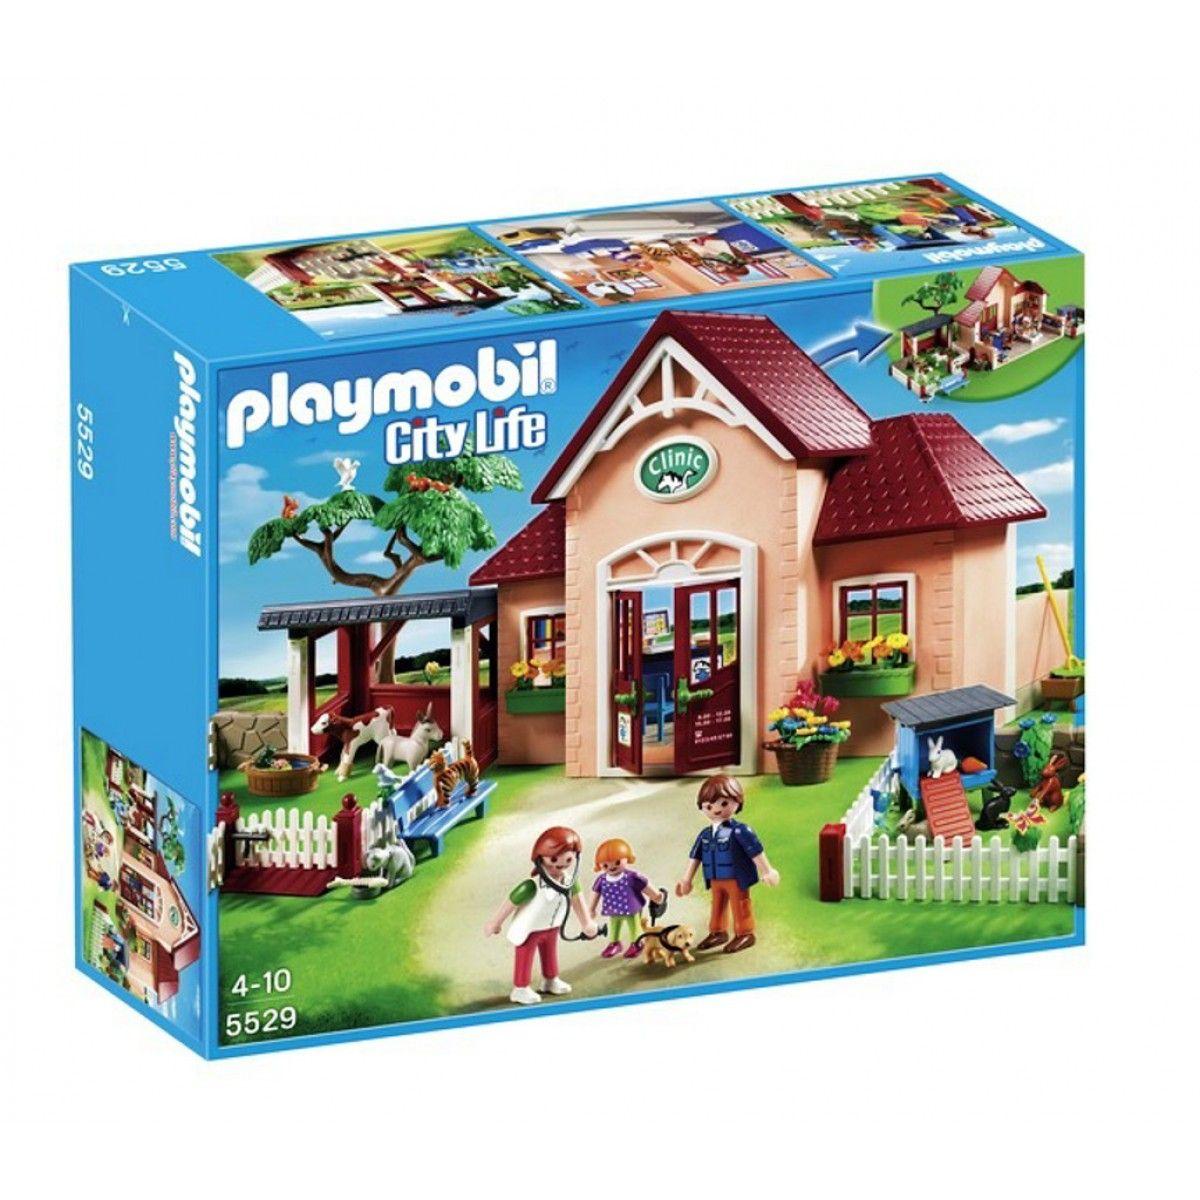 Playmobil Kthniatrikh Klinikh 5529 Playmobil Playset Playmobil Sets